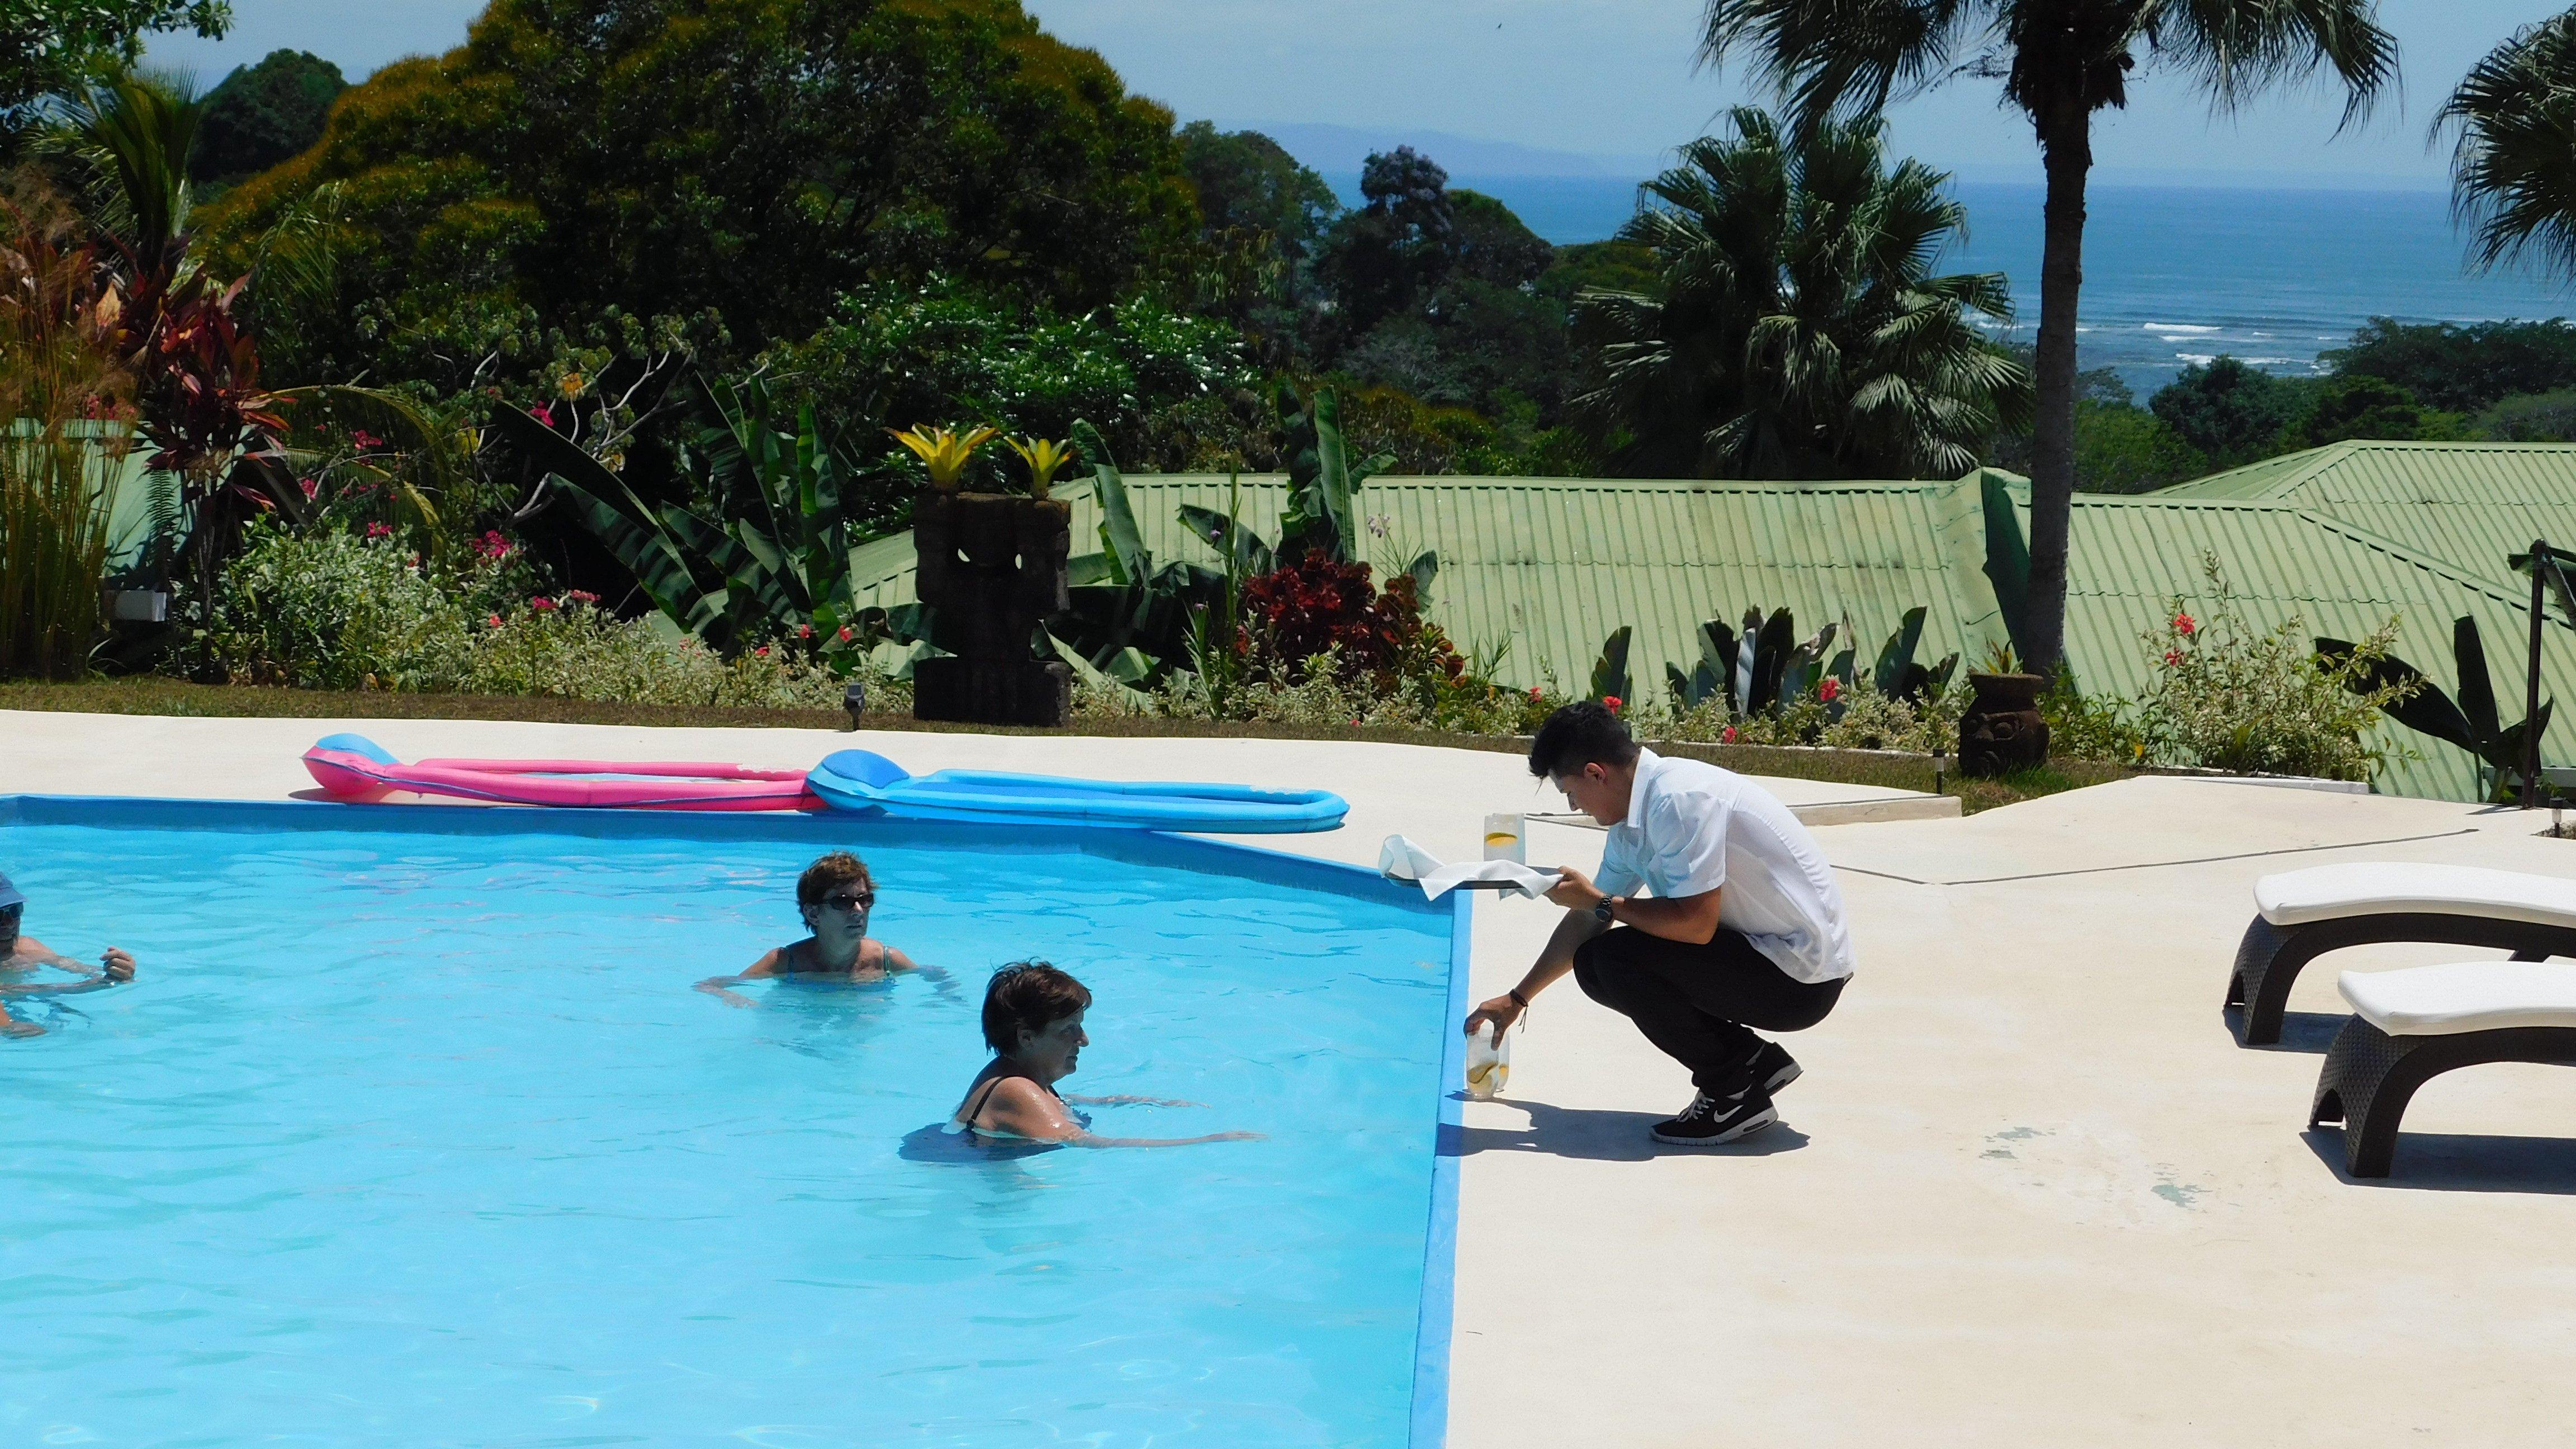 The Pool at the Lookout at Playa Tortuga